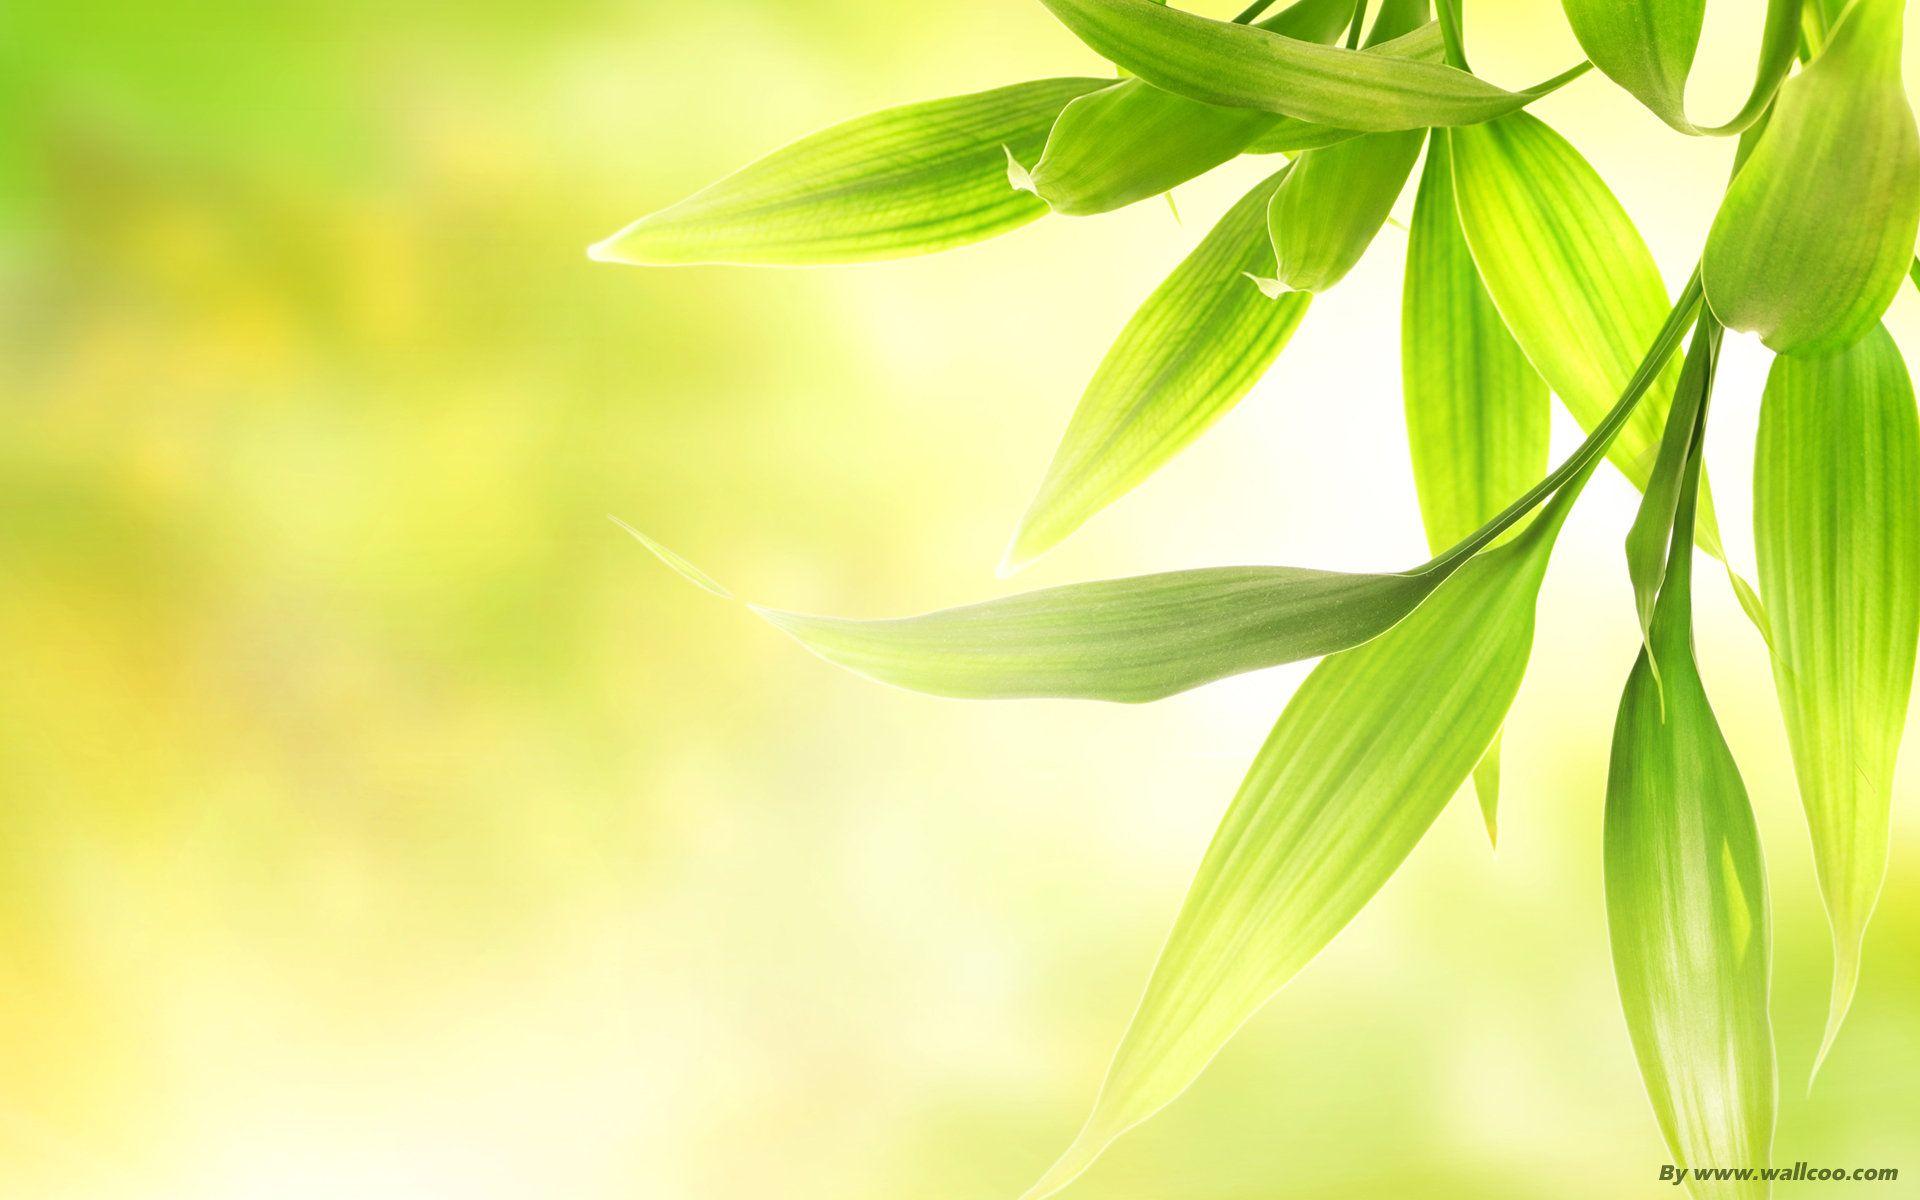 MySpringFashionPalette catalogs Green funeral, Natural